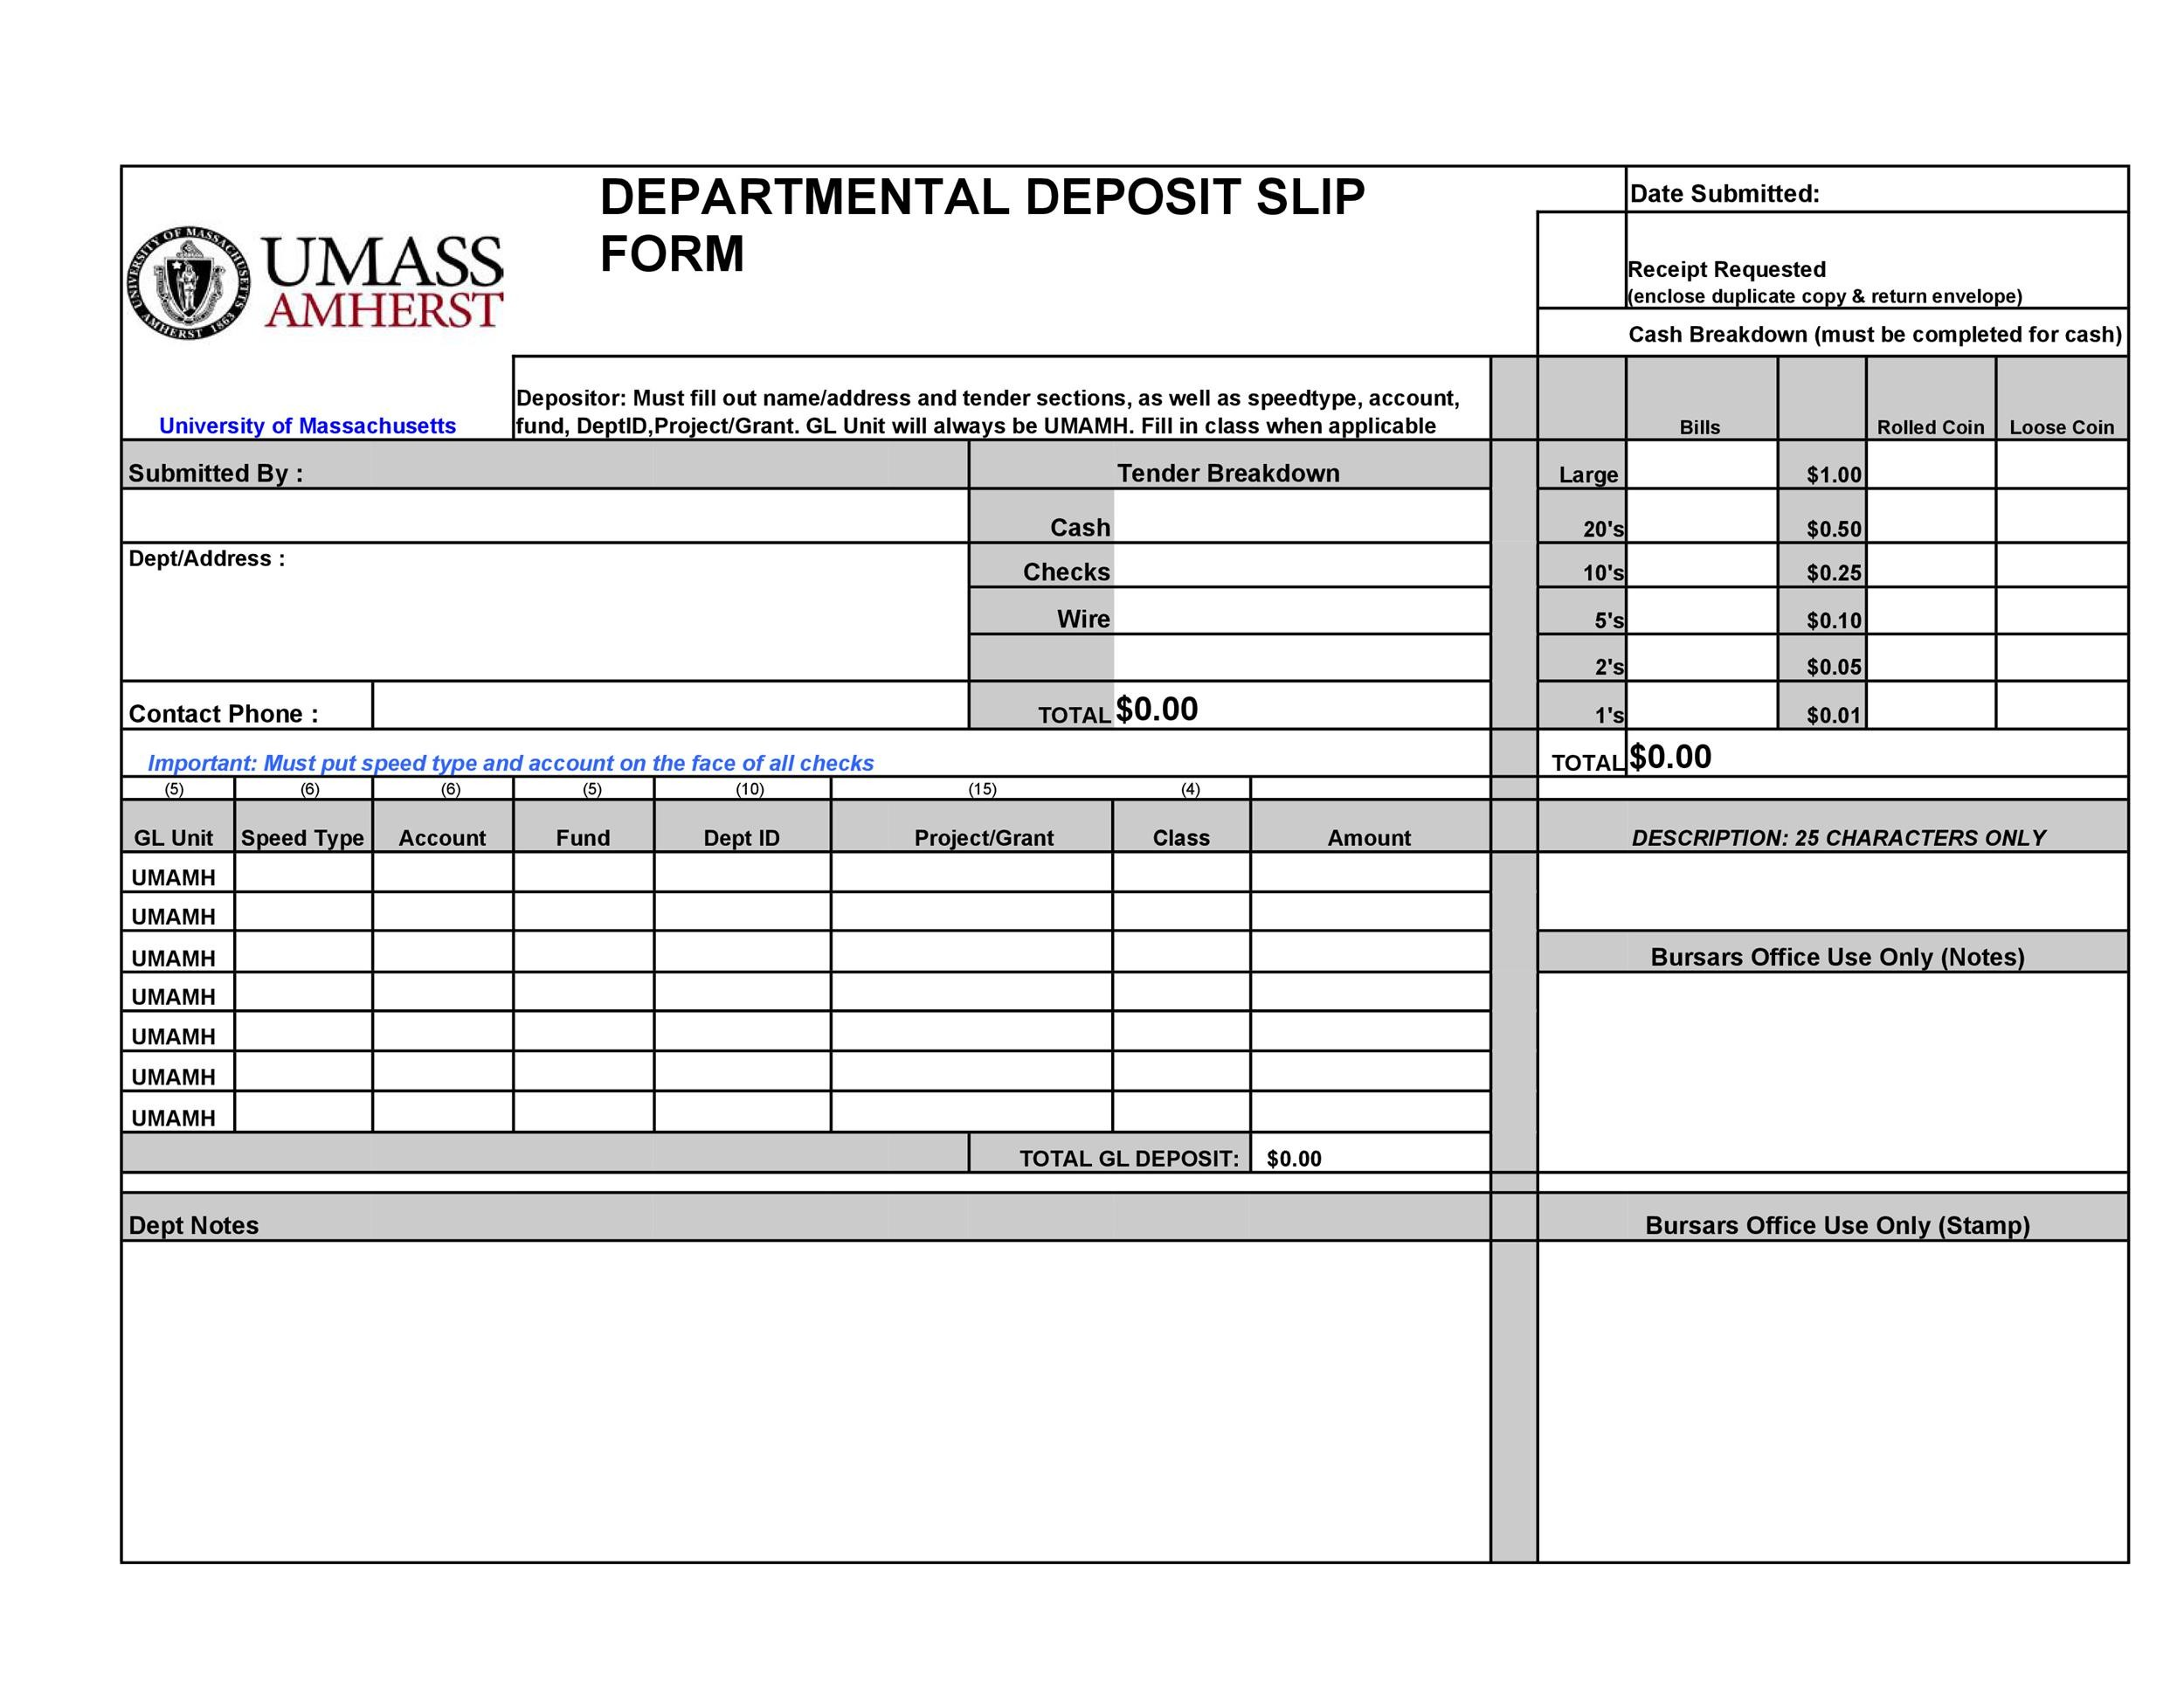 37 Bank Deposit Slip Templates  Examples - Template Lab